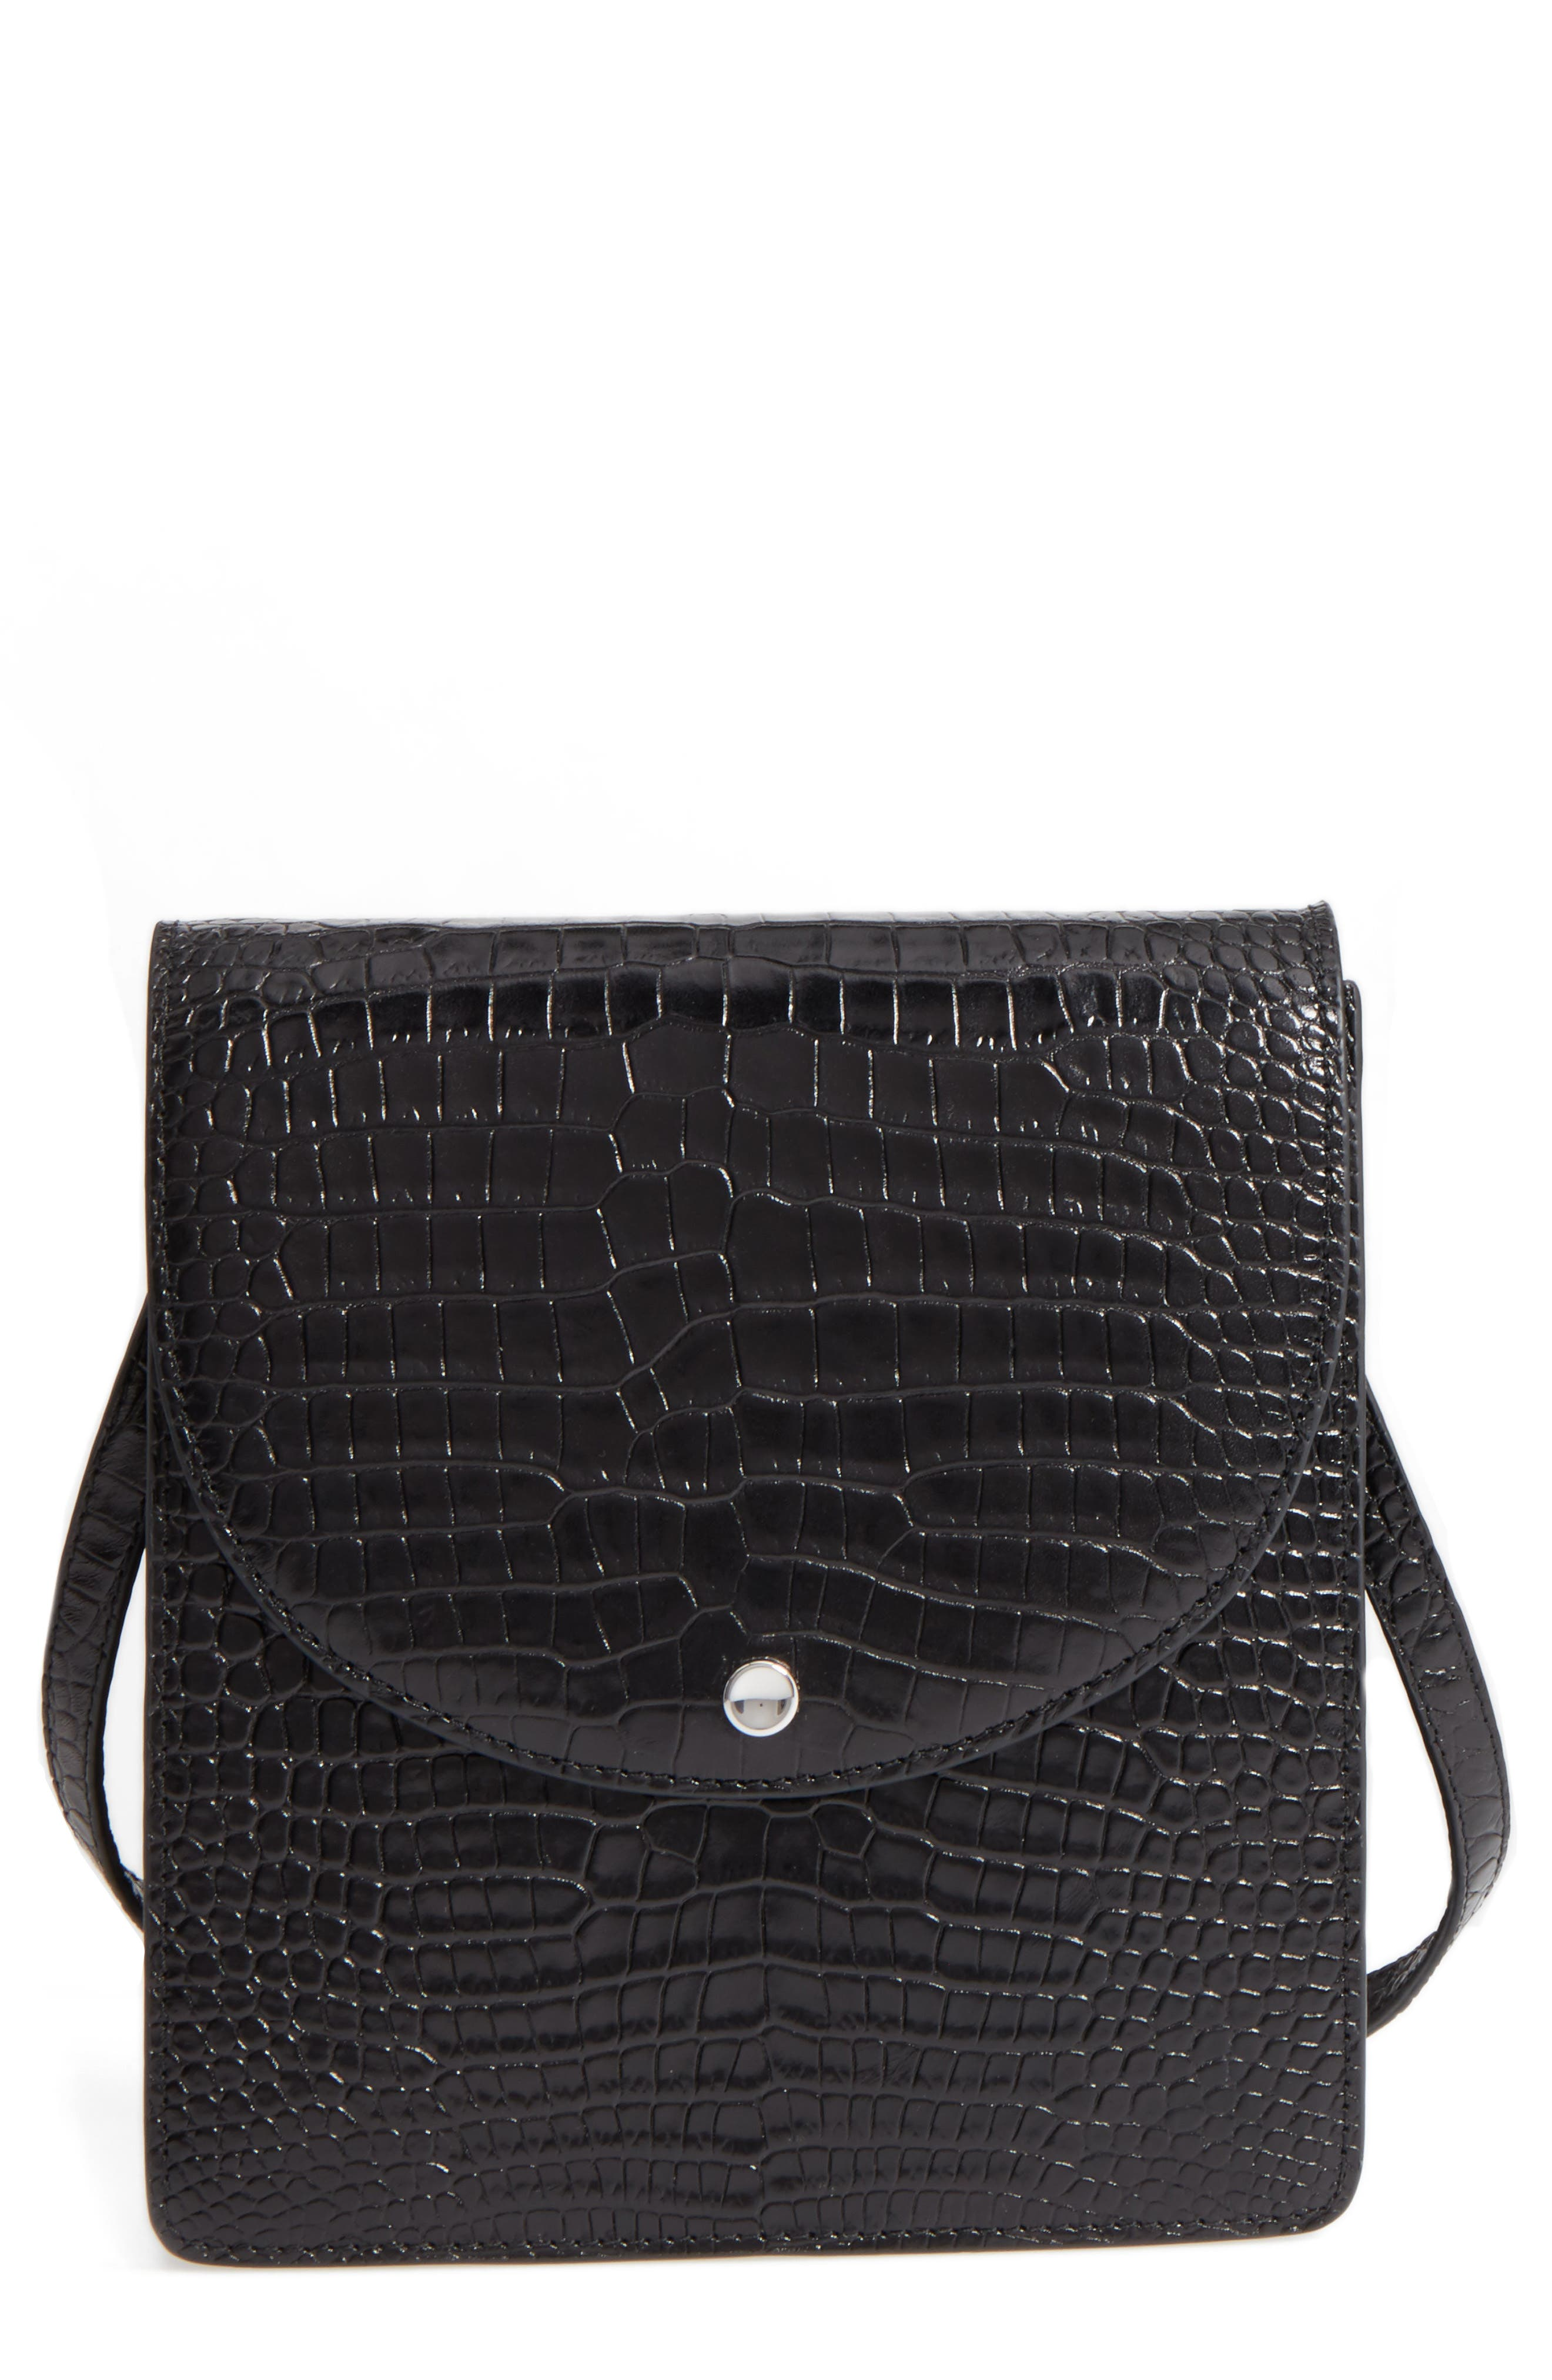 Eloise Leather Crossbody Bag,                         Main,                         color, Black